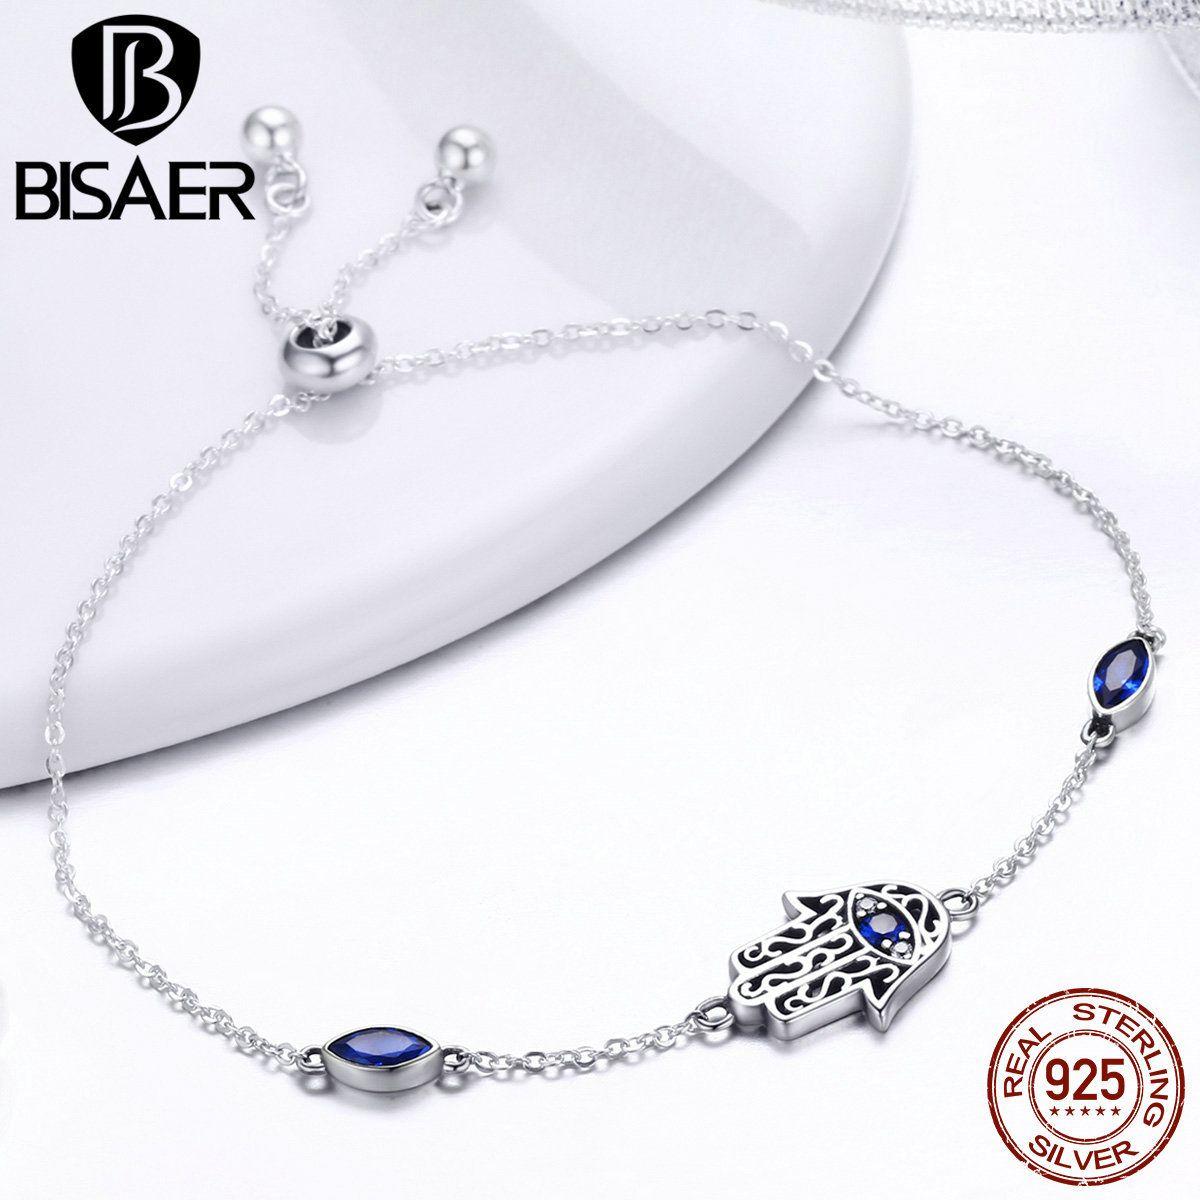 BISAER 925 Sterling Silver Hamsa Hand Fatima Hand Chain Link Bracelets Pulseira Lucky Female Women Bracelets Fine Jewelry ECB076 1028